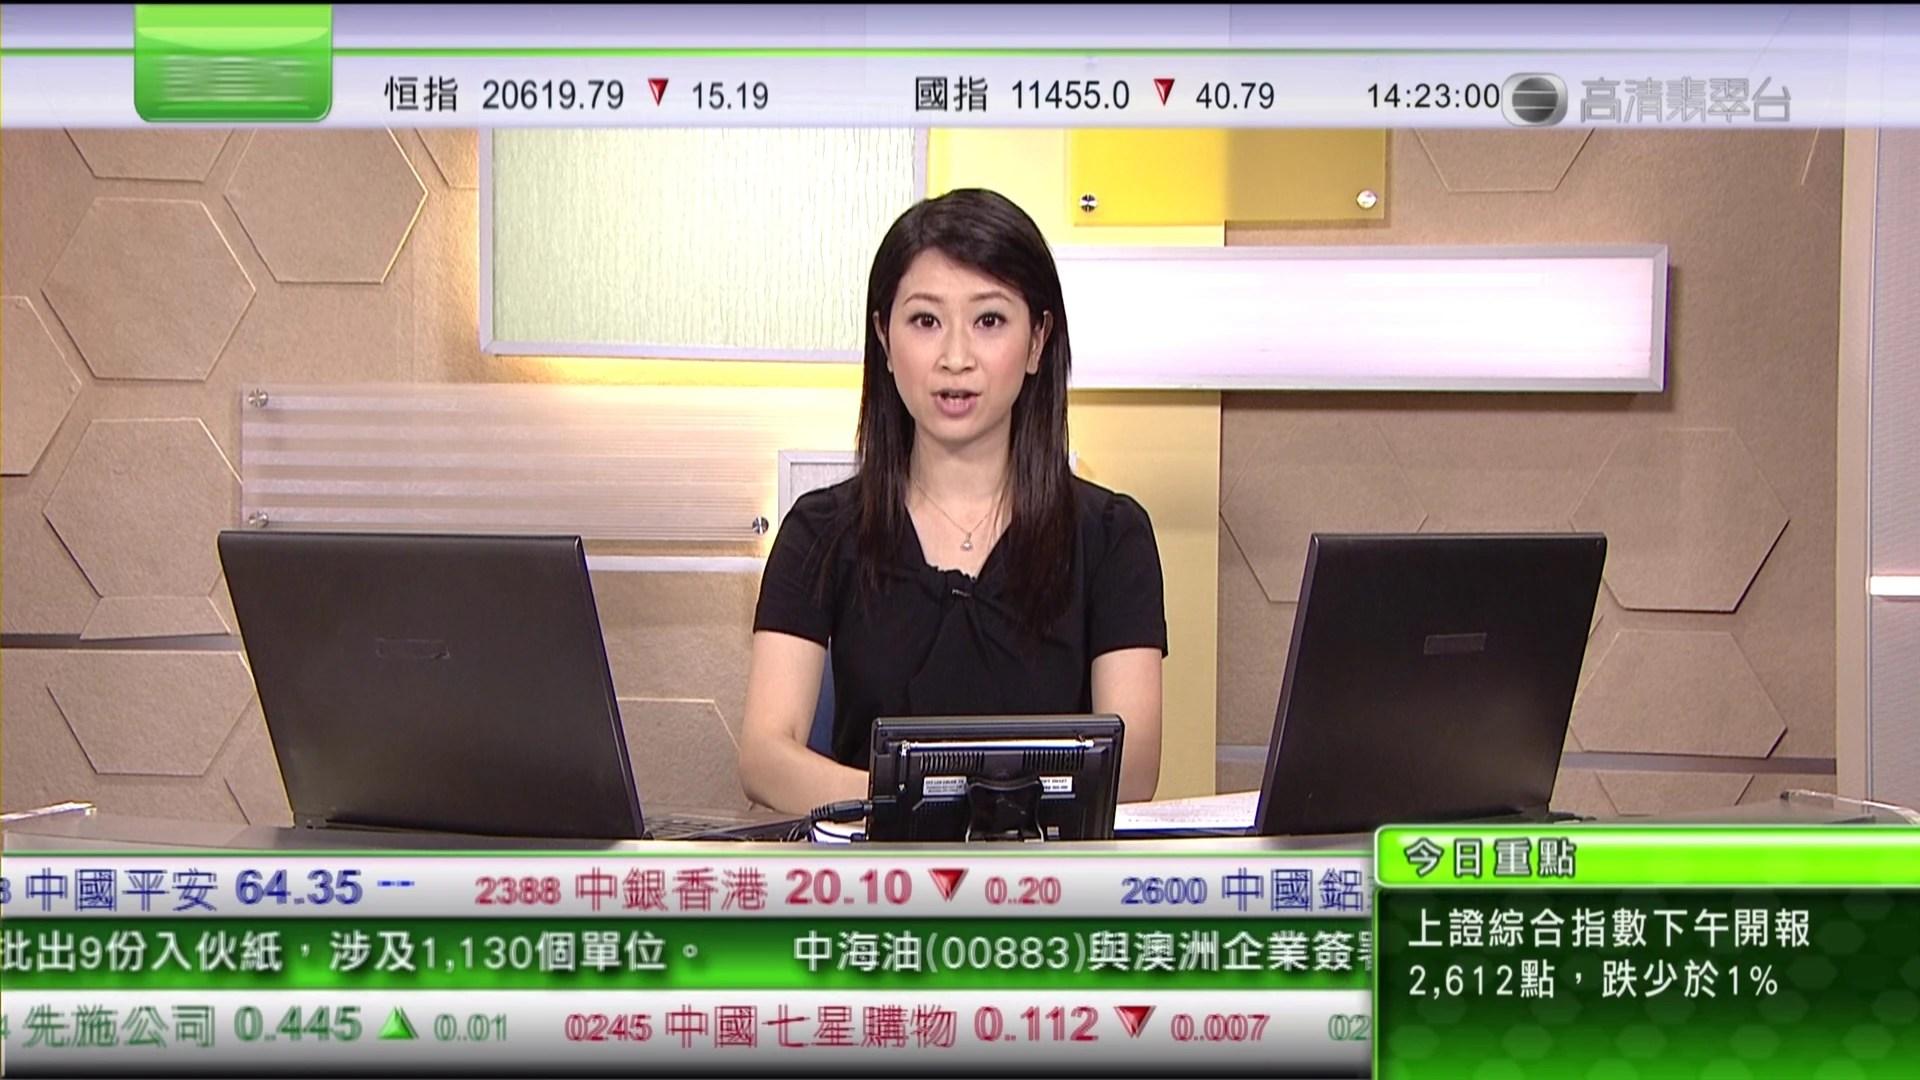 圖像 - TVB HDJ grey icon 260810.jpg   香港網絡大典   FANDOM powered by Wikia